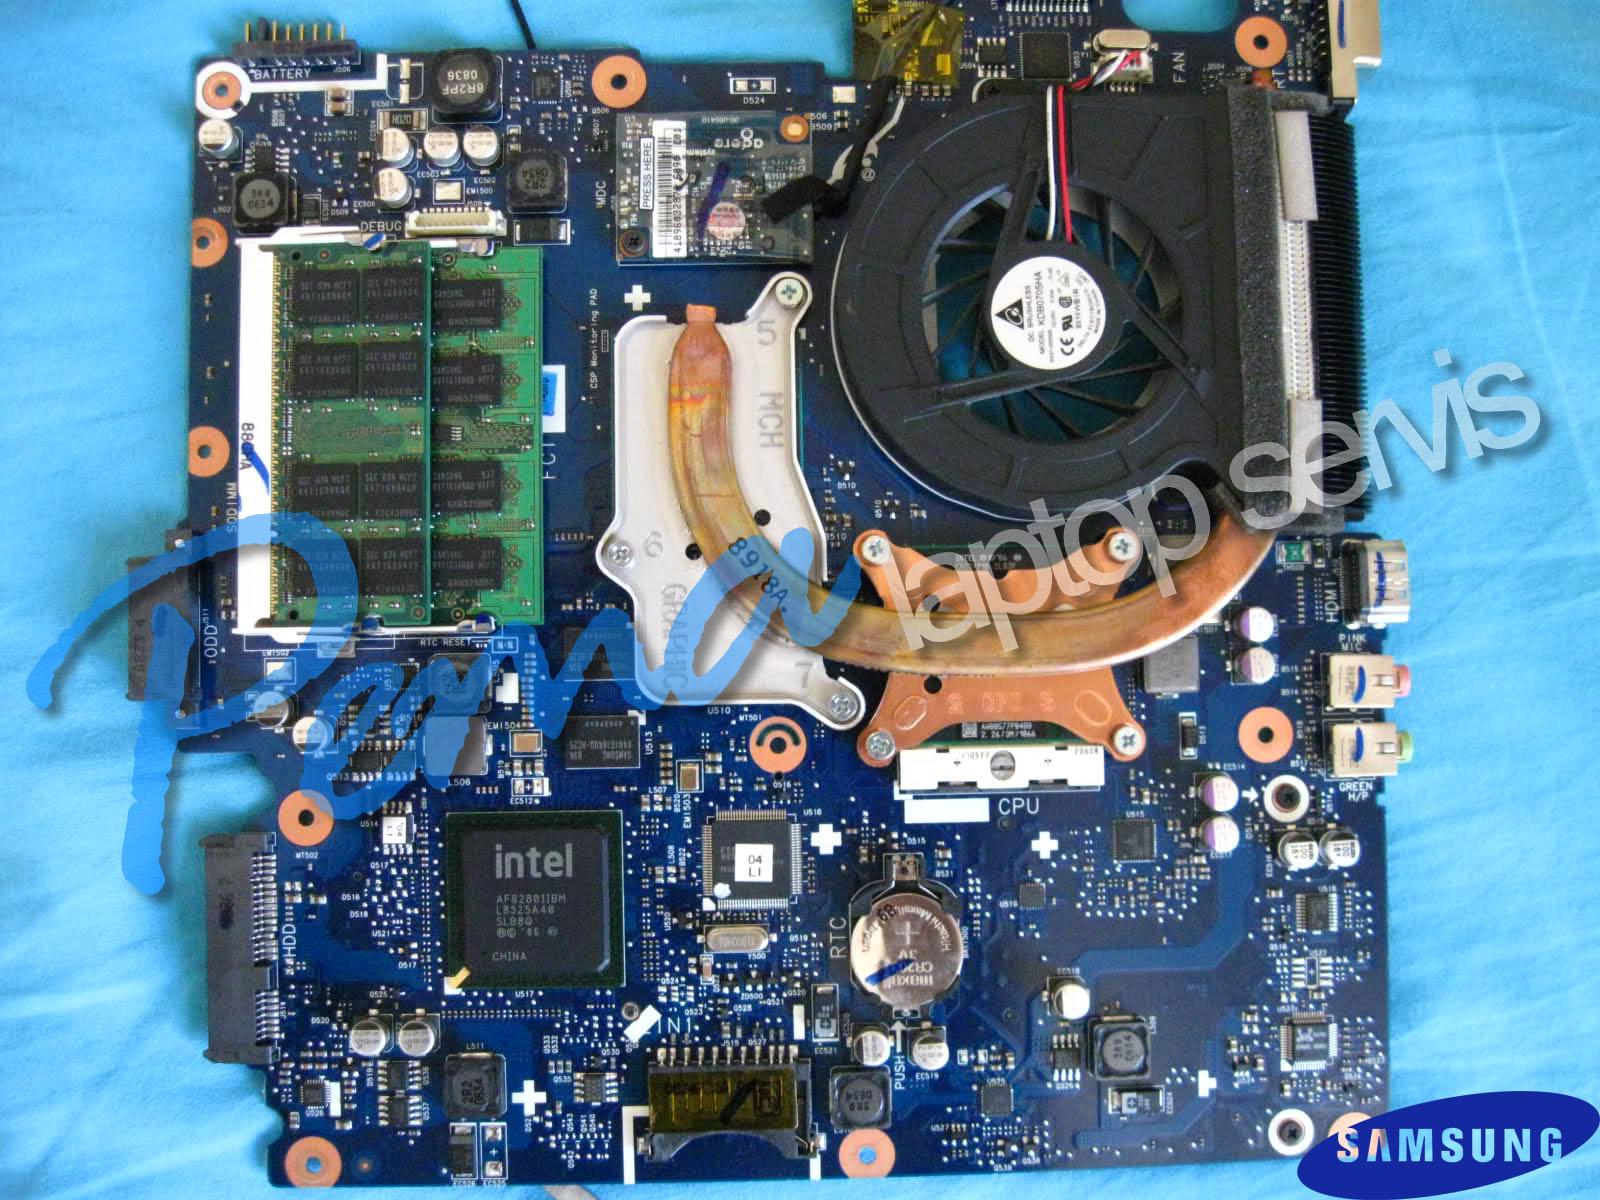 SAMSUNG NP-R508-DA01TR NP-R508-DS01TR ANAKART